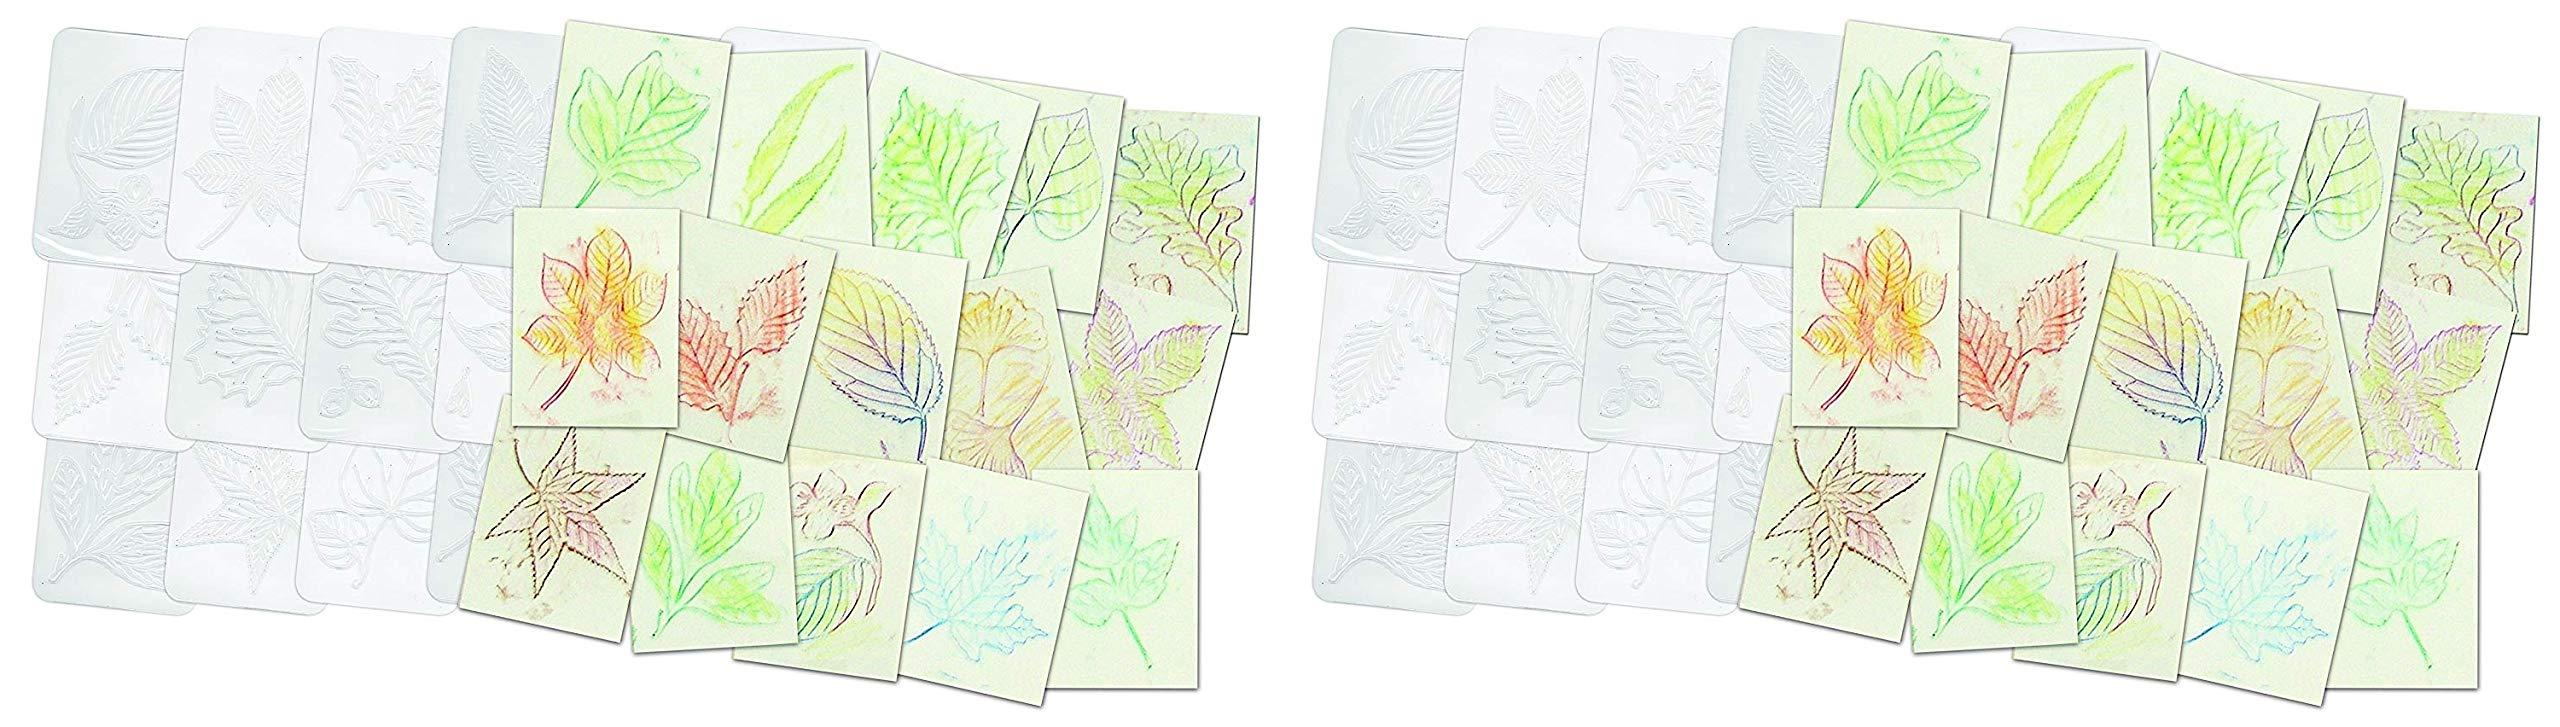 Roylco Leaf Rubbing Plates (Тwо Расk) by Roylco